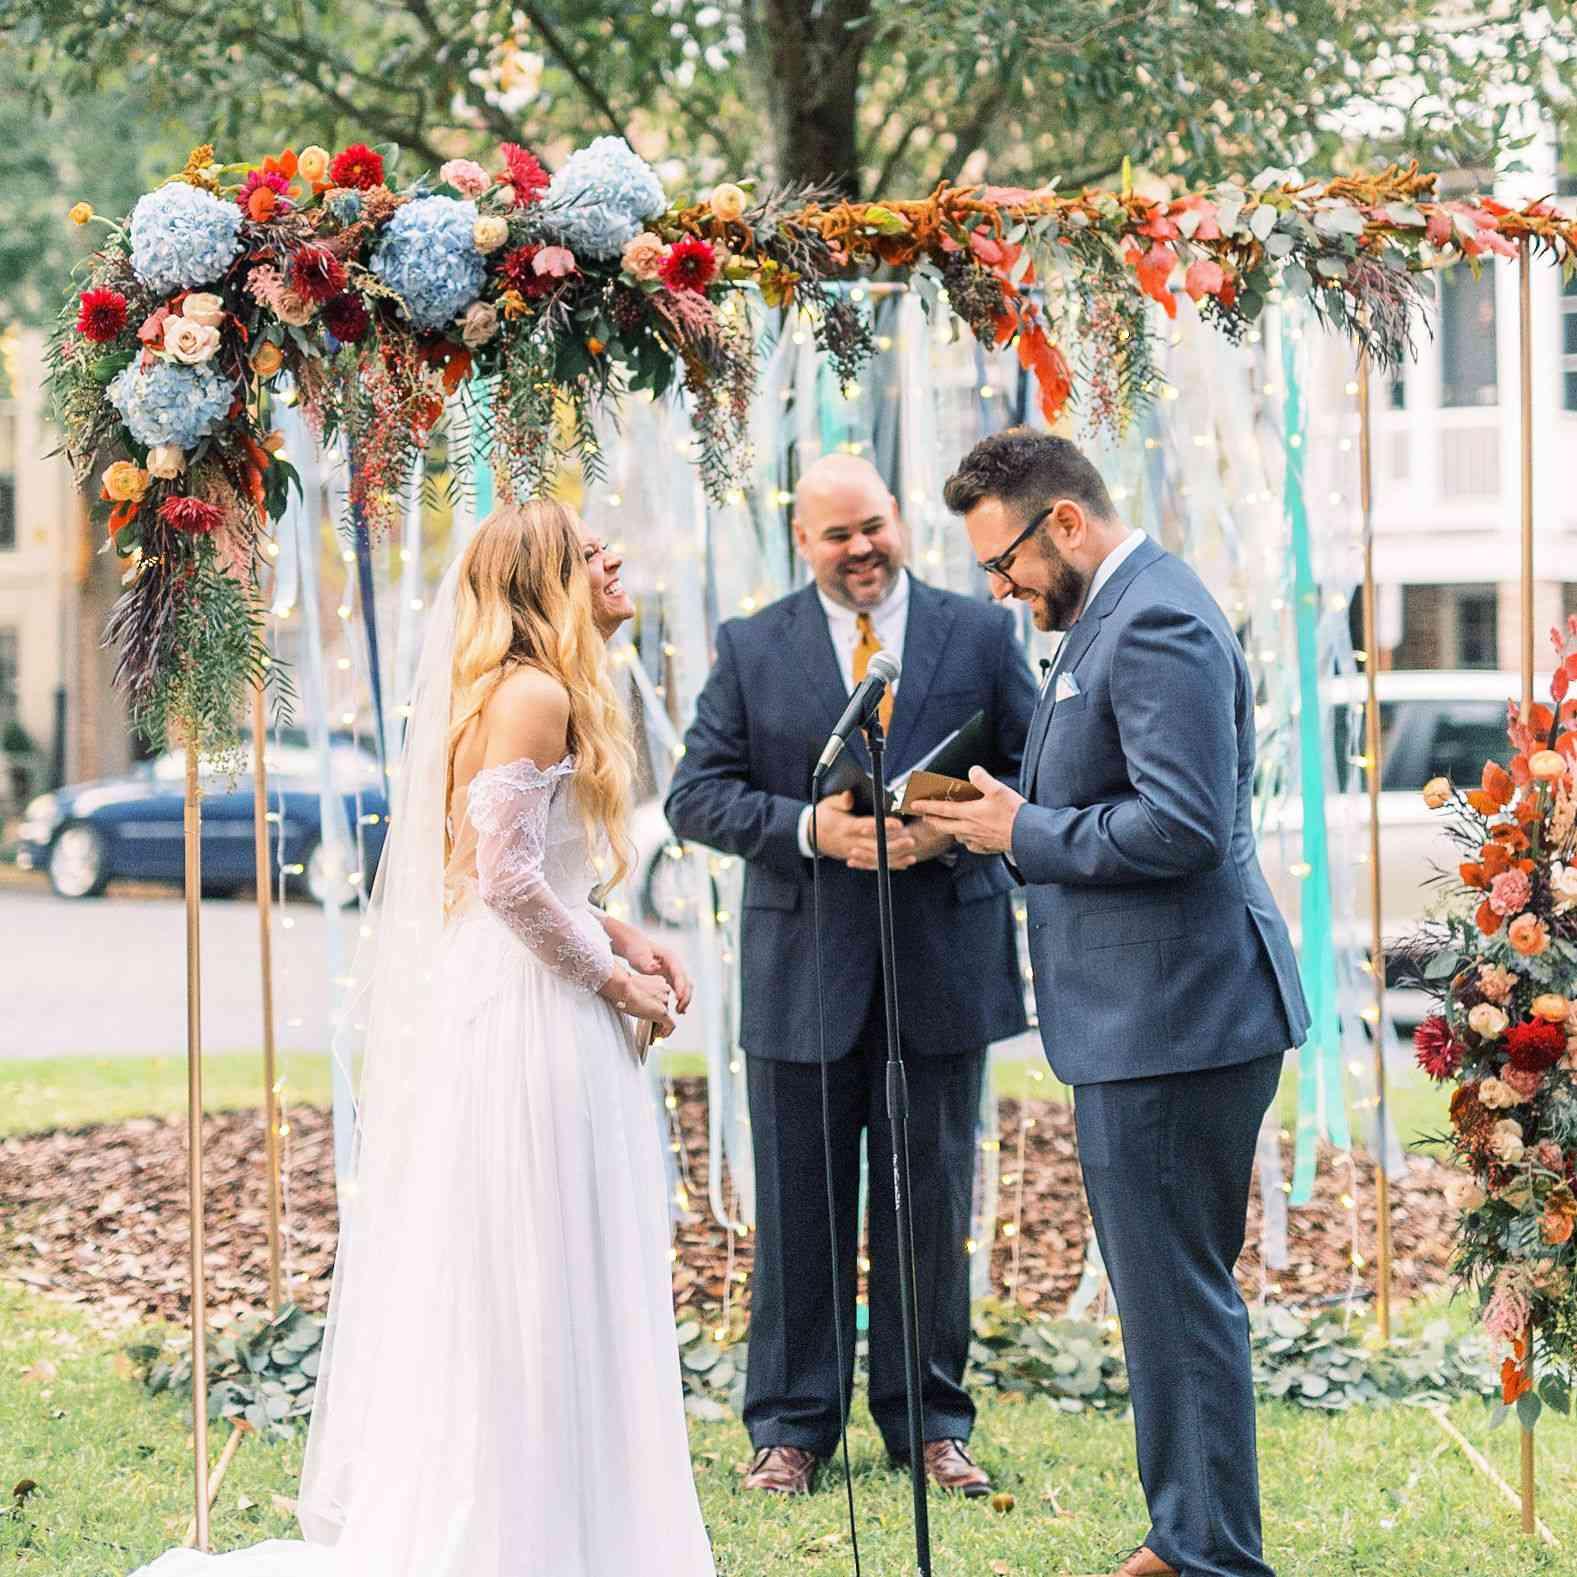 whimsical savannah wedding, bride and groom exchanging vows